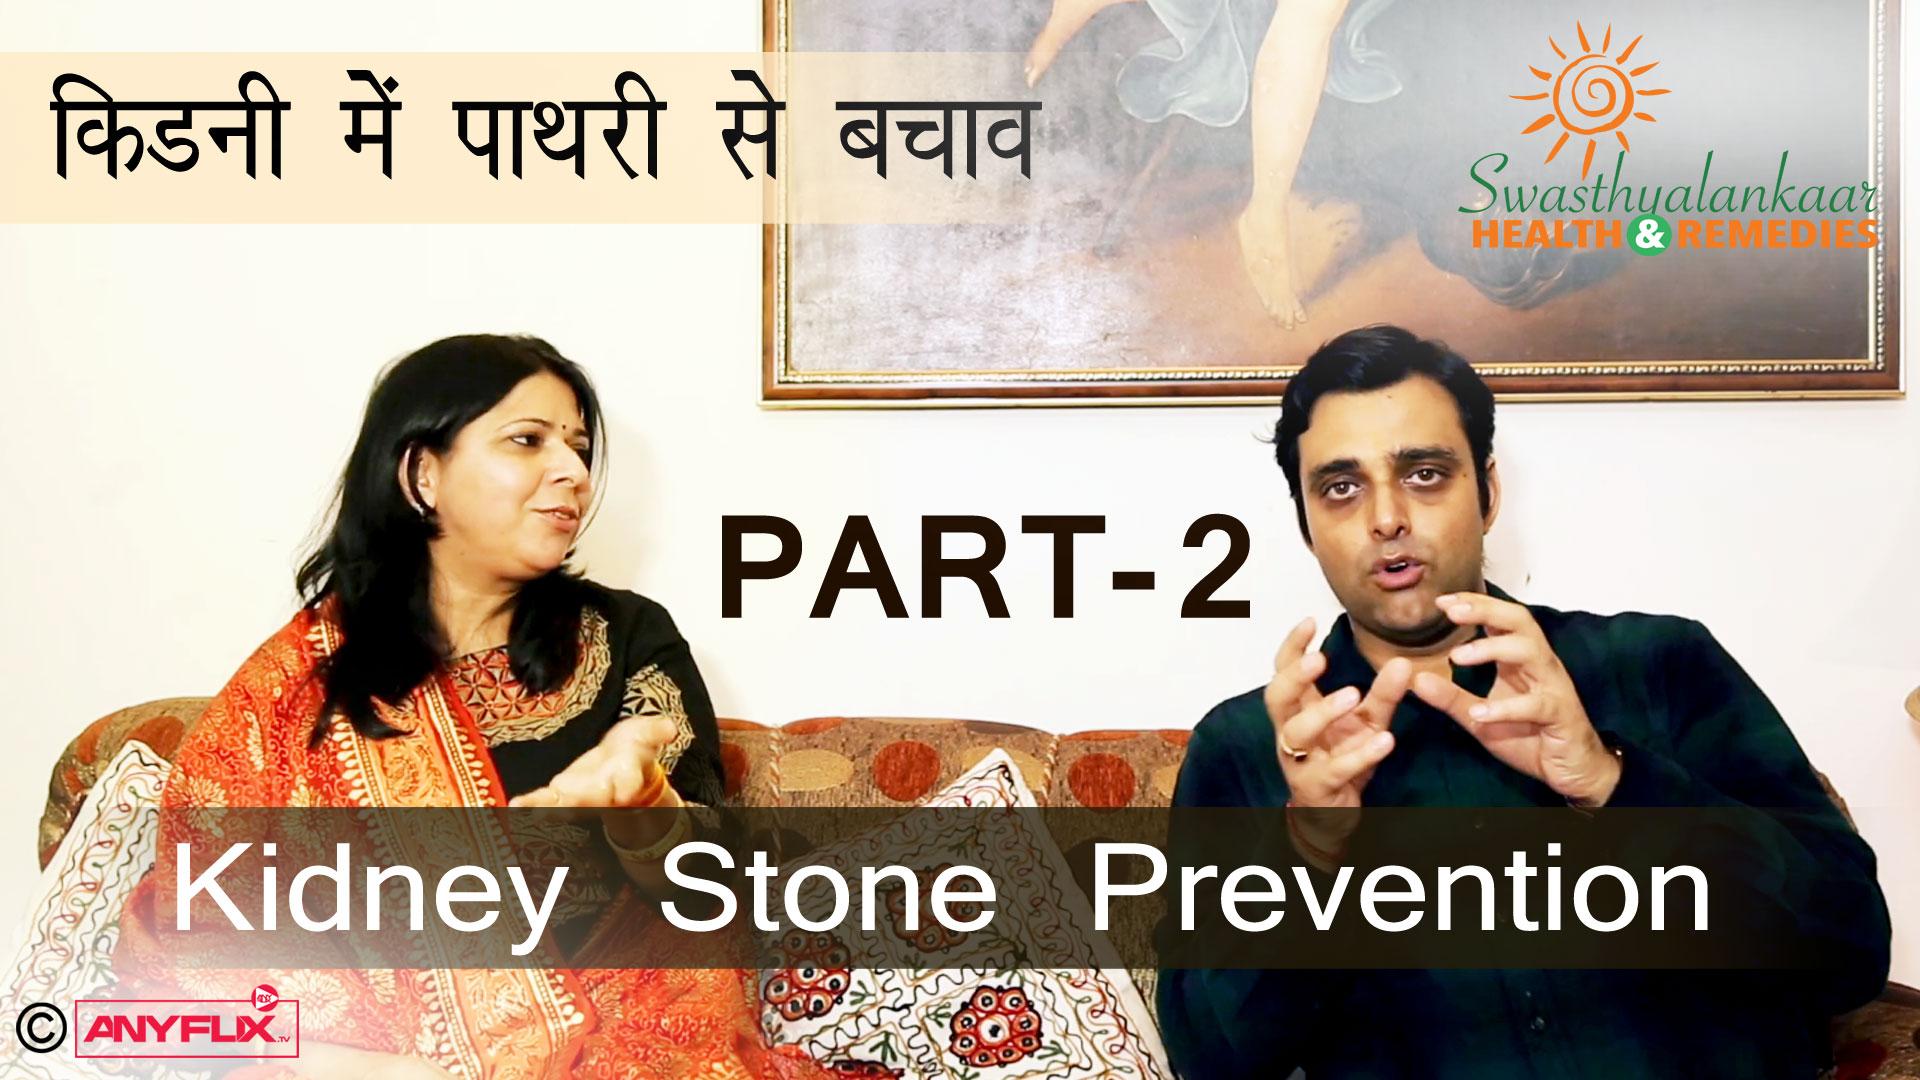 किडनी में पथरी से बचाव   Kidney Stone Prevention – Part 02   Swasthyalankaar Health and Remedies